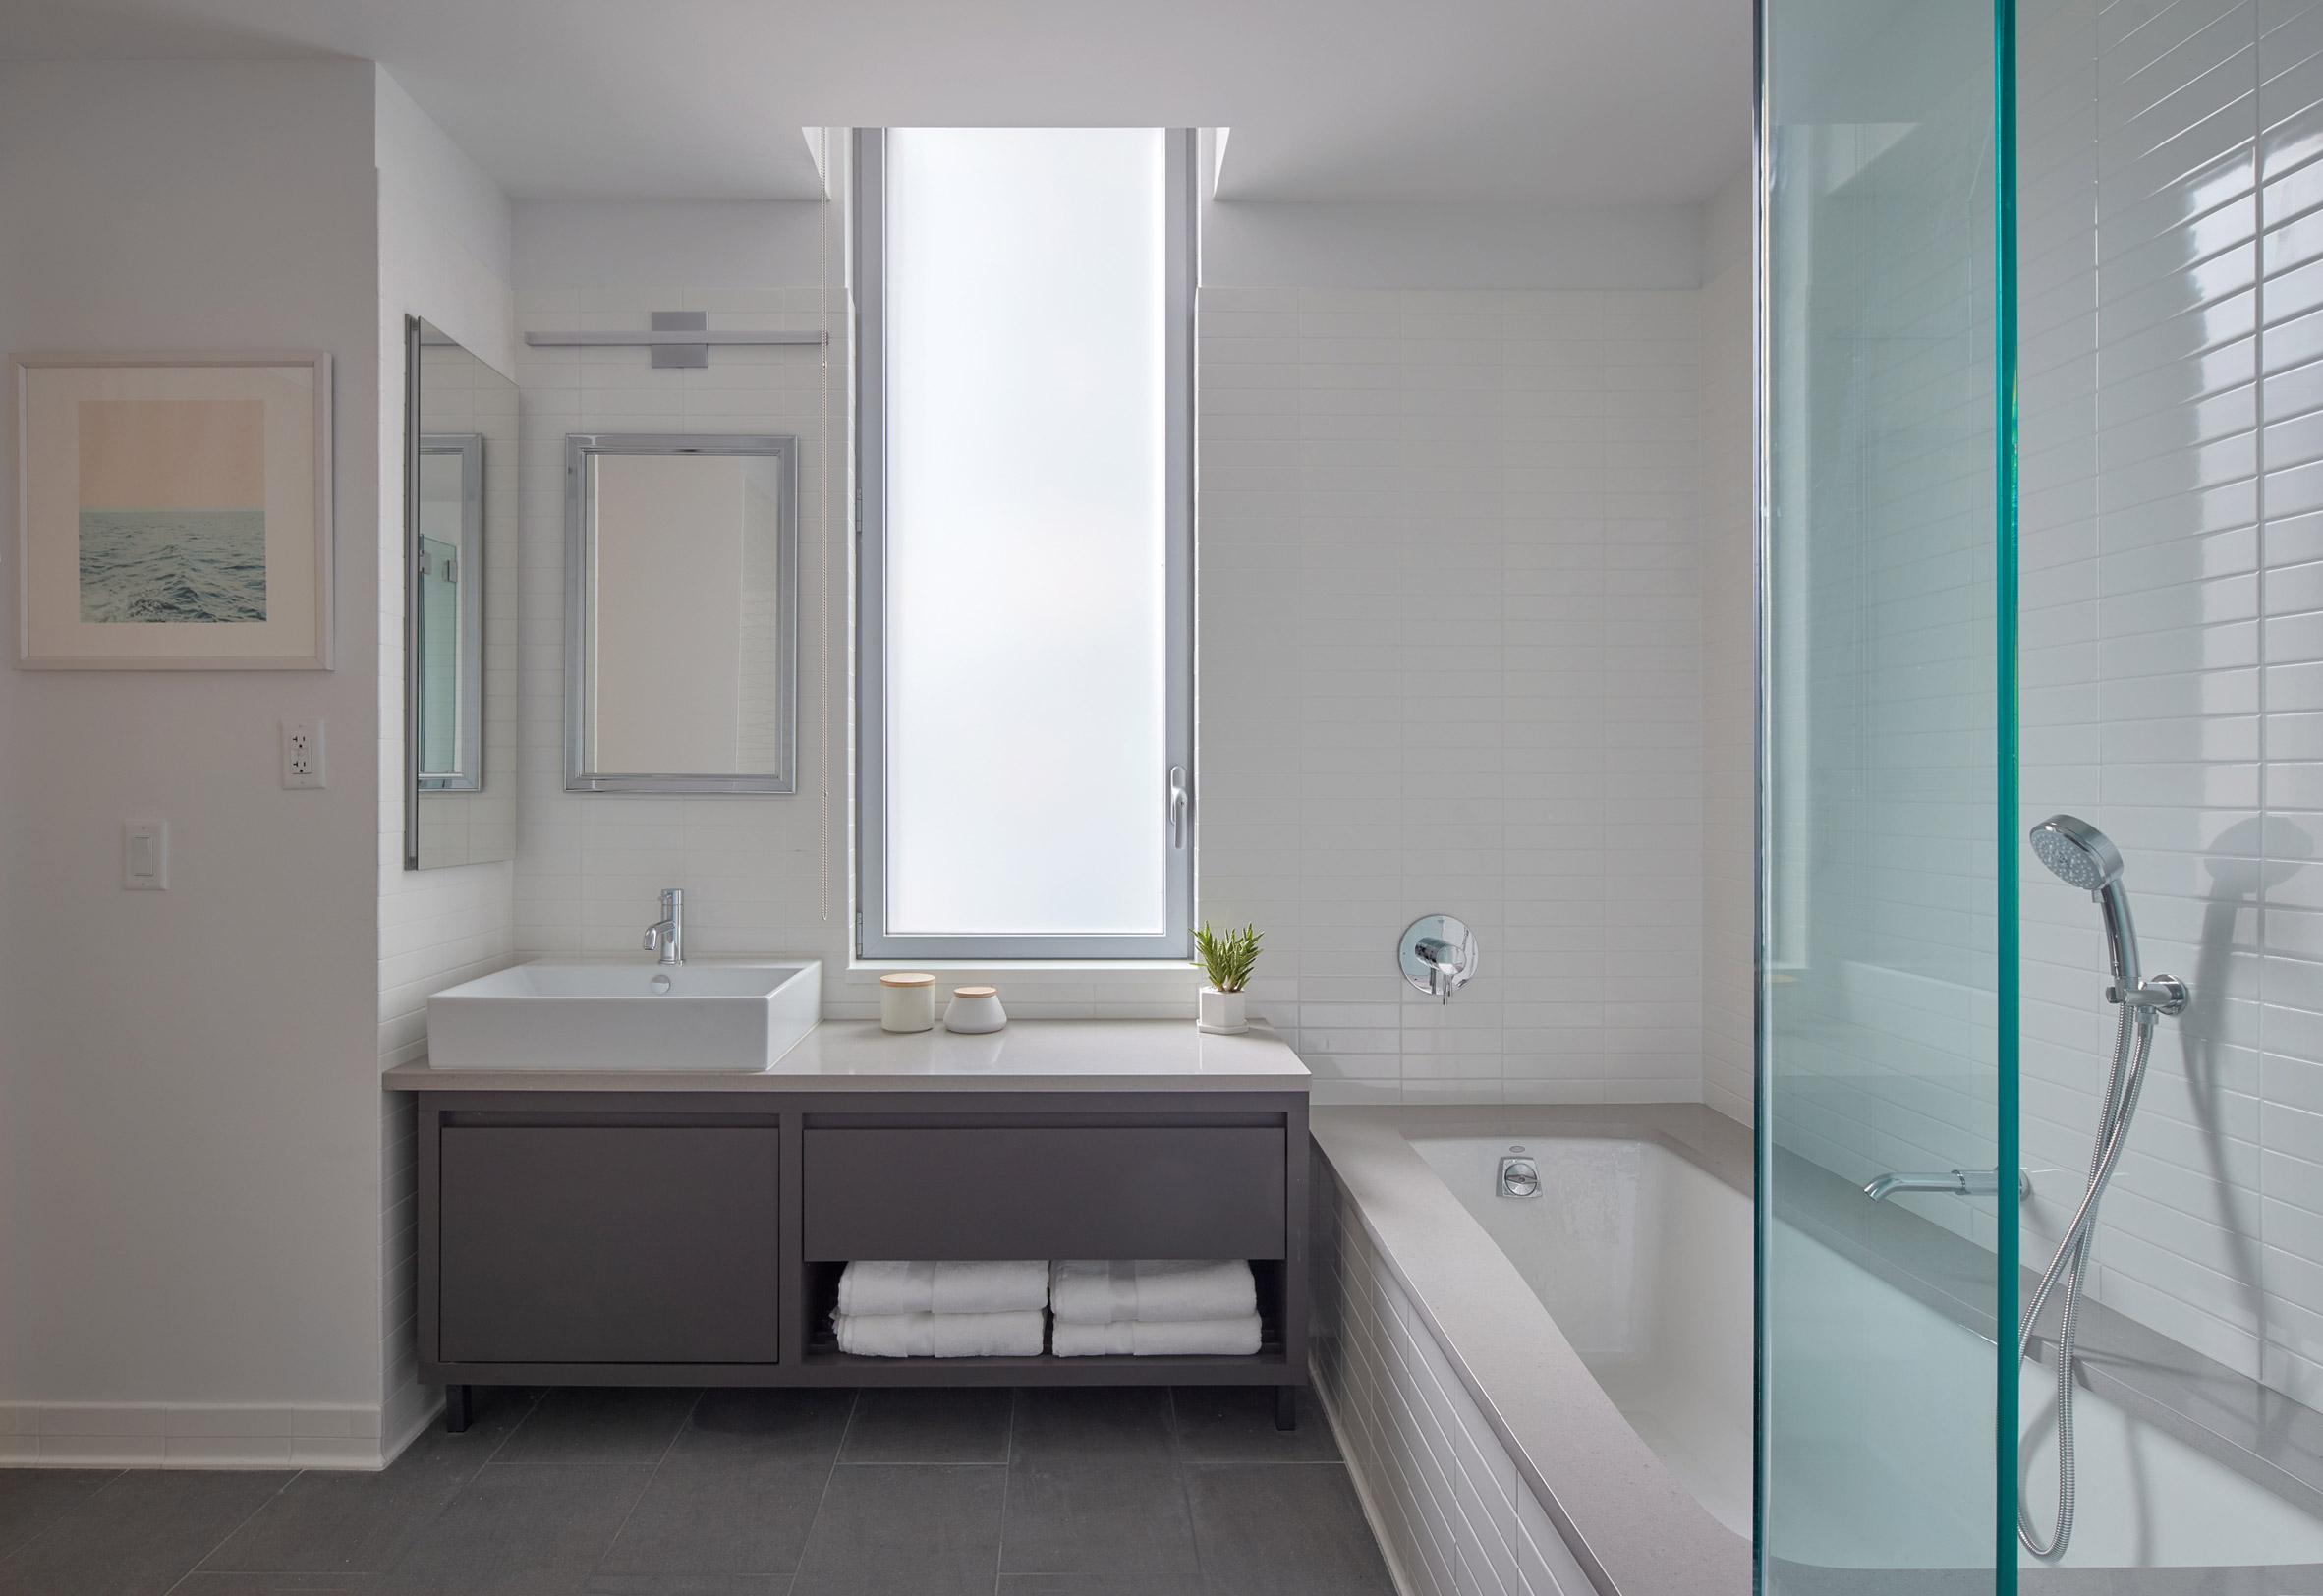 325-kent-shop-architects-brooklyn-noko-015.jpg